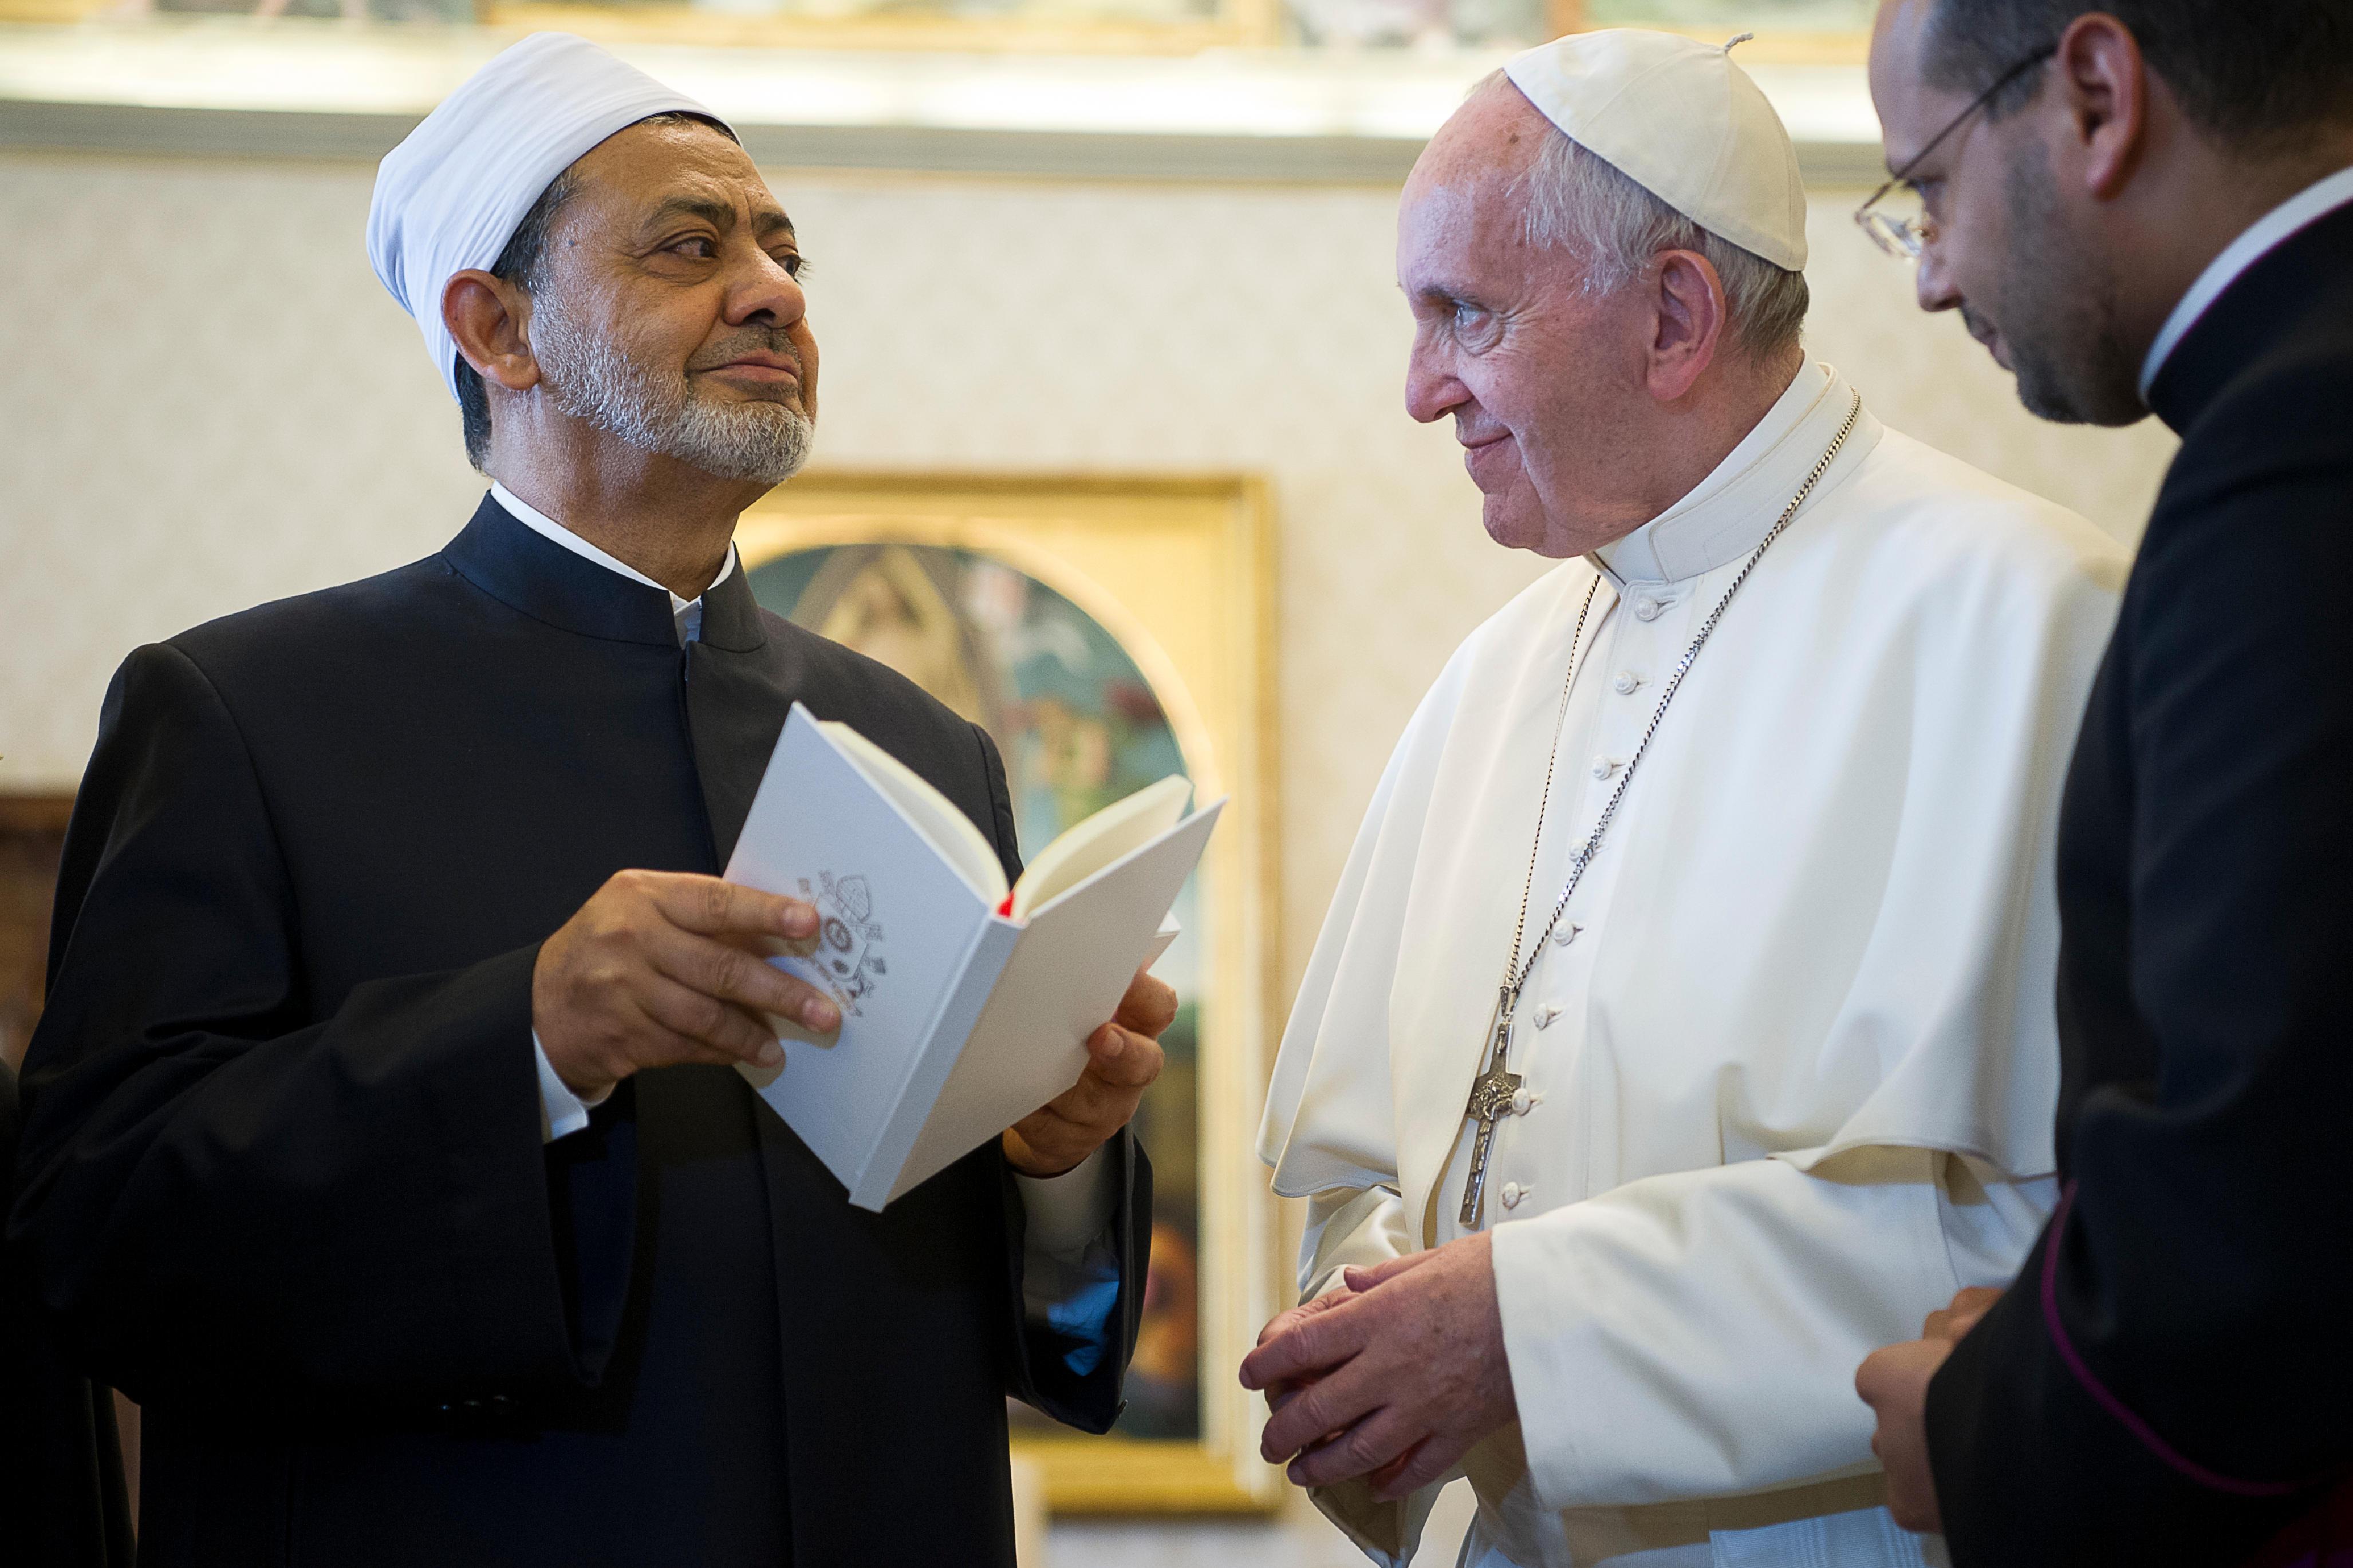 Le pape François offre Laudato si' au grand imam Ahmed el-Tayeb, L'Osservatore Romano